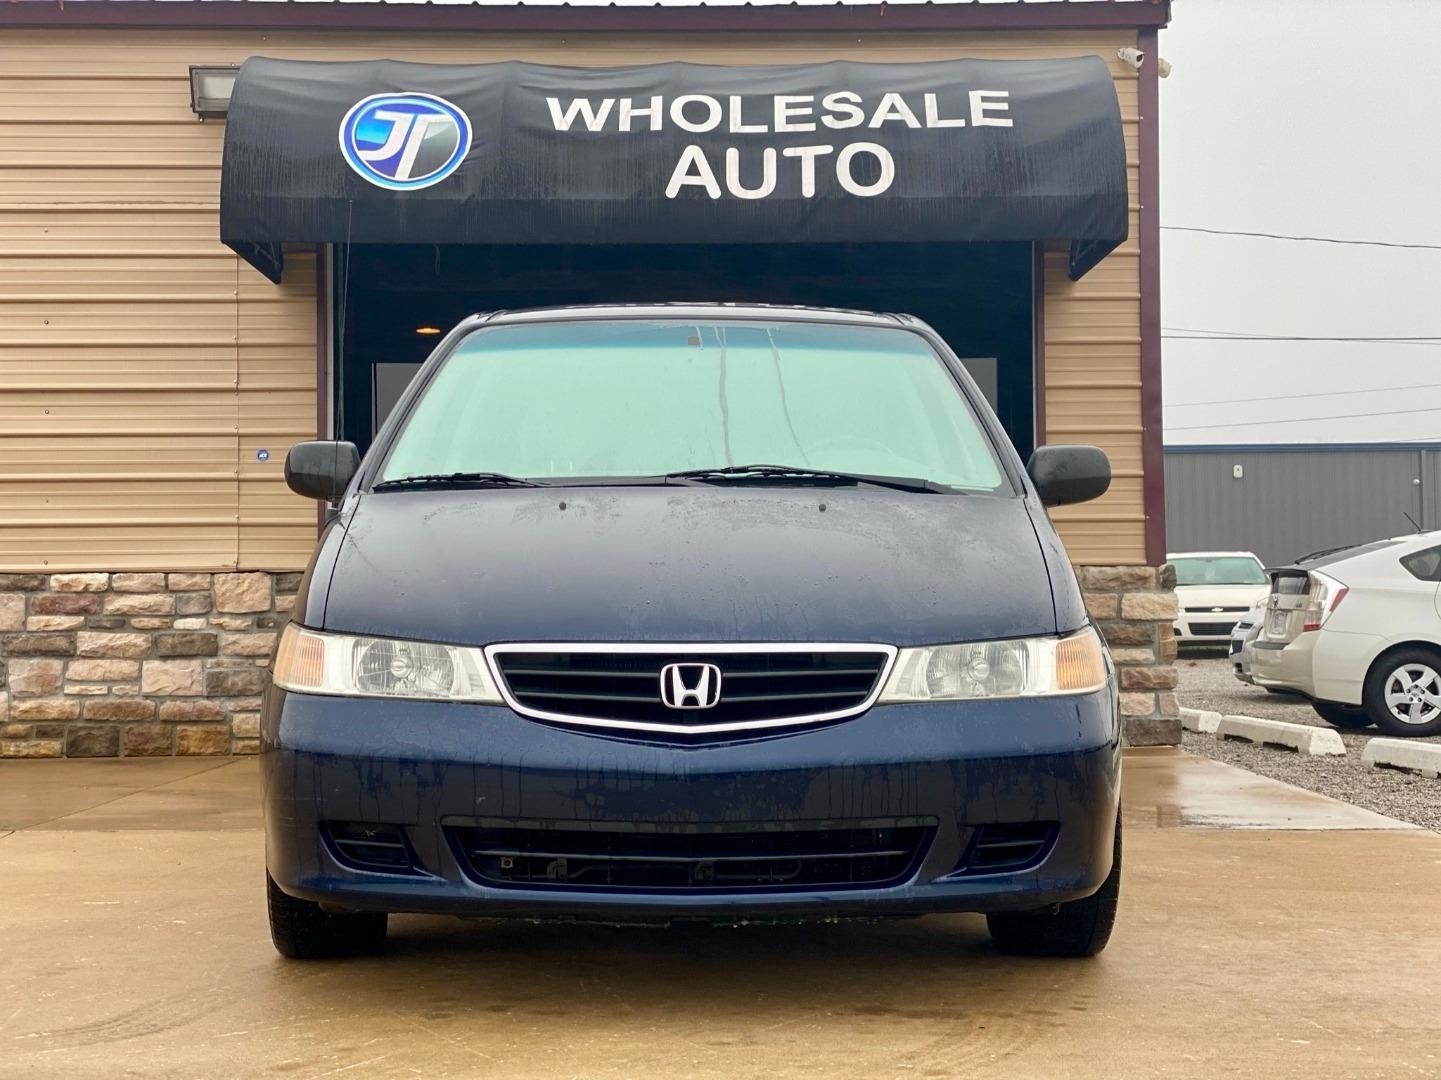 2003 Honda Odyssey 5dr Lx Jt Wholesale Auto Inc Dealership In Broken Arrow